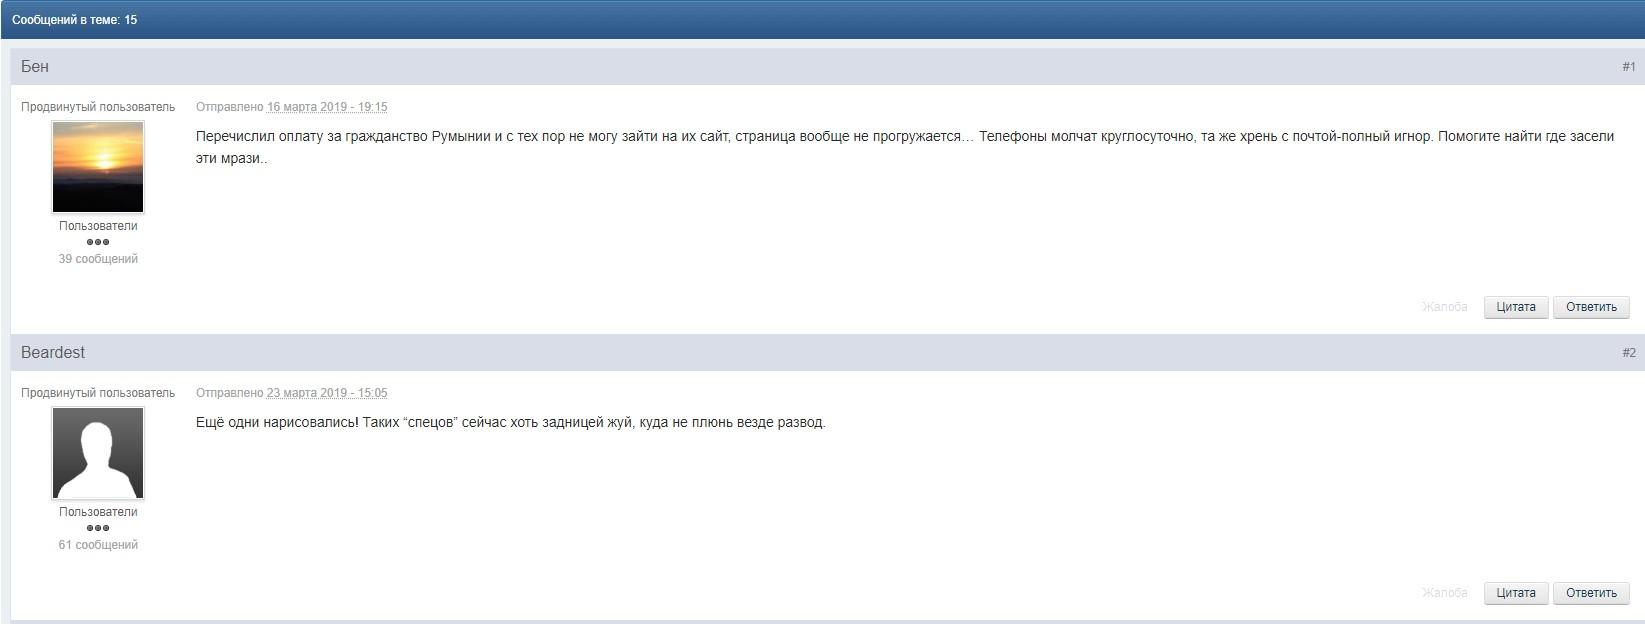 Отзыв о Immigrate.expert на forum-eu.com